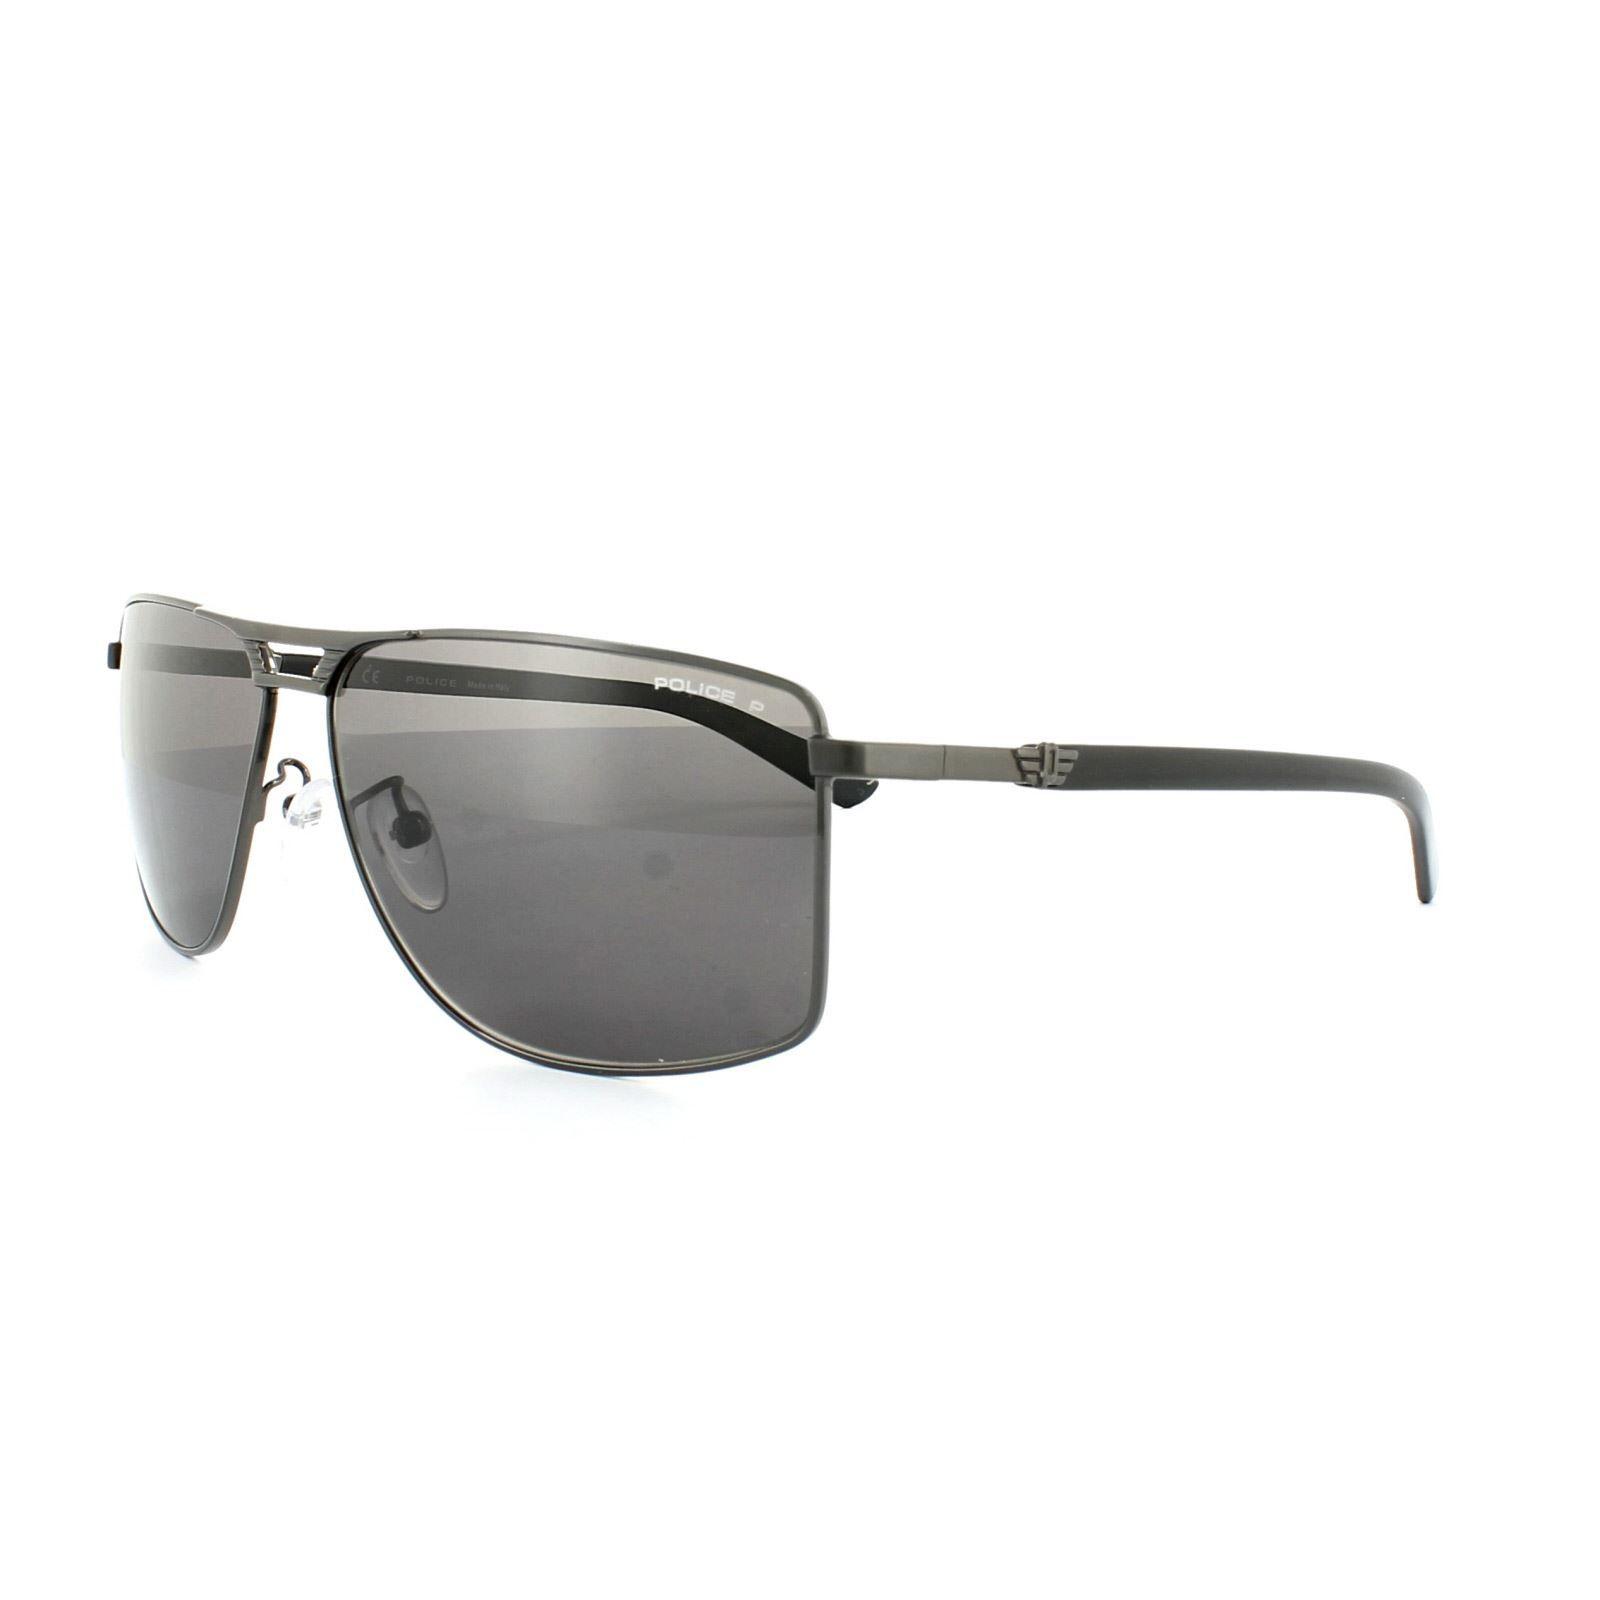 Police Sunglasses S8848 Flash 1 584P Shiny Gunmetal Grey Grey Polarized